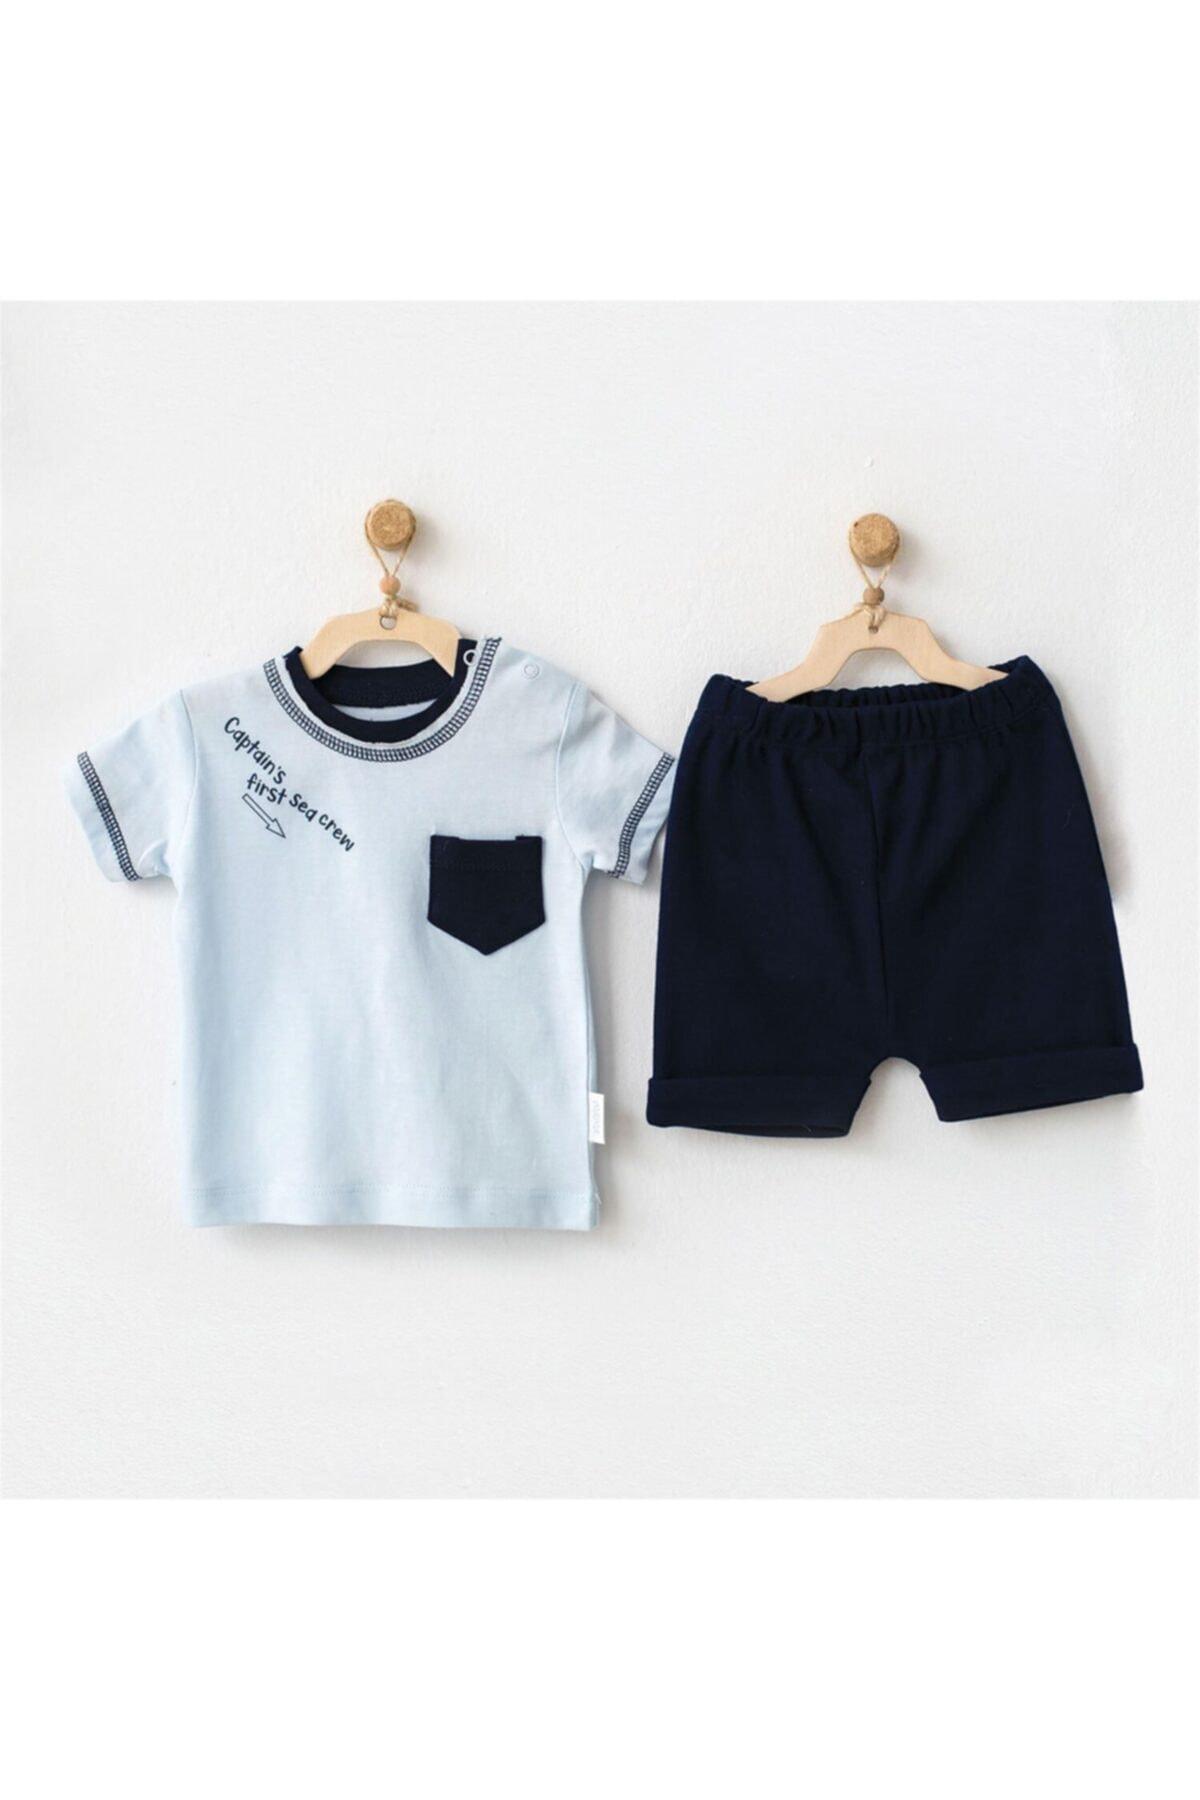 andywawa Ac20561 Bebek Pantolon 2 Li Pant Little Marine 1